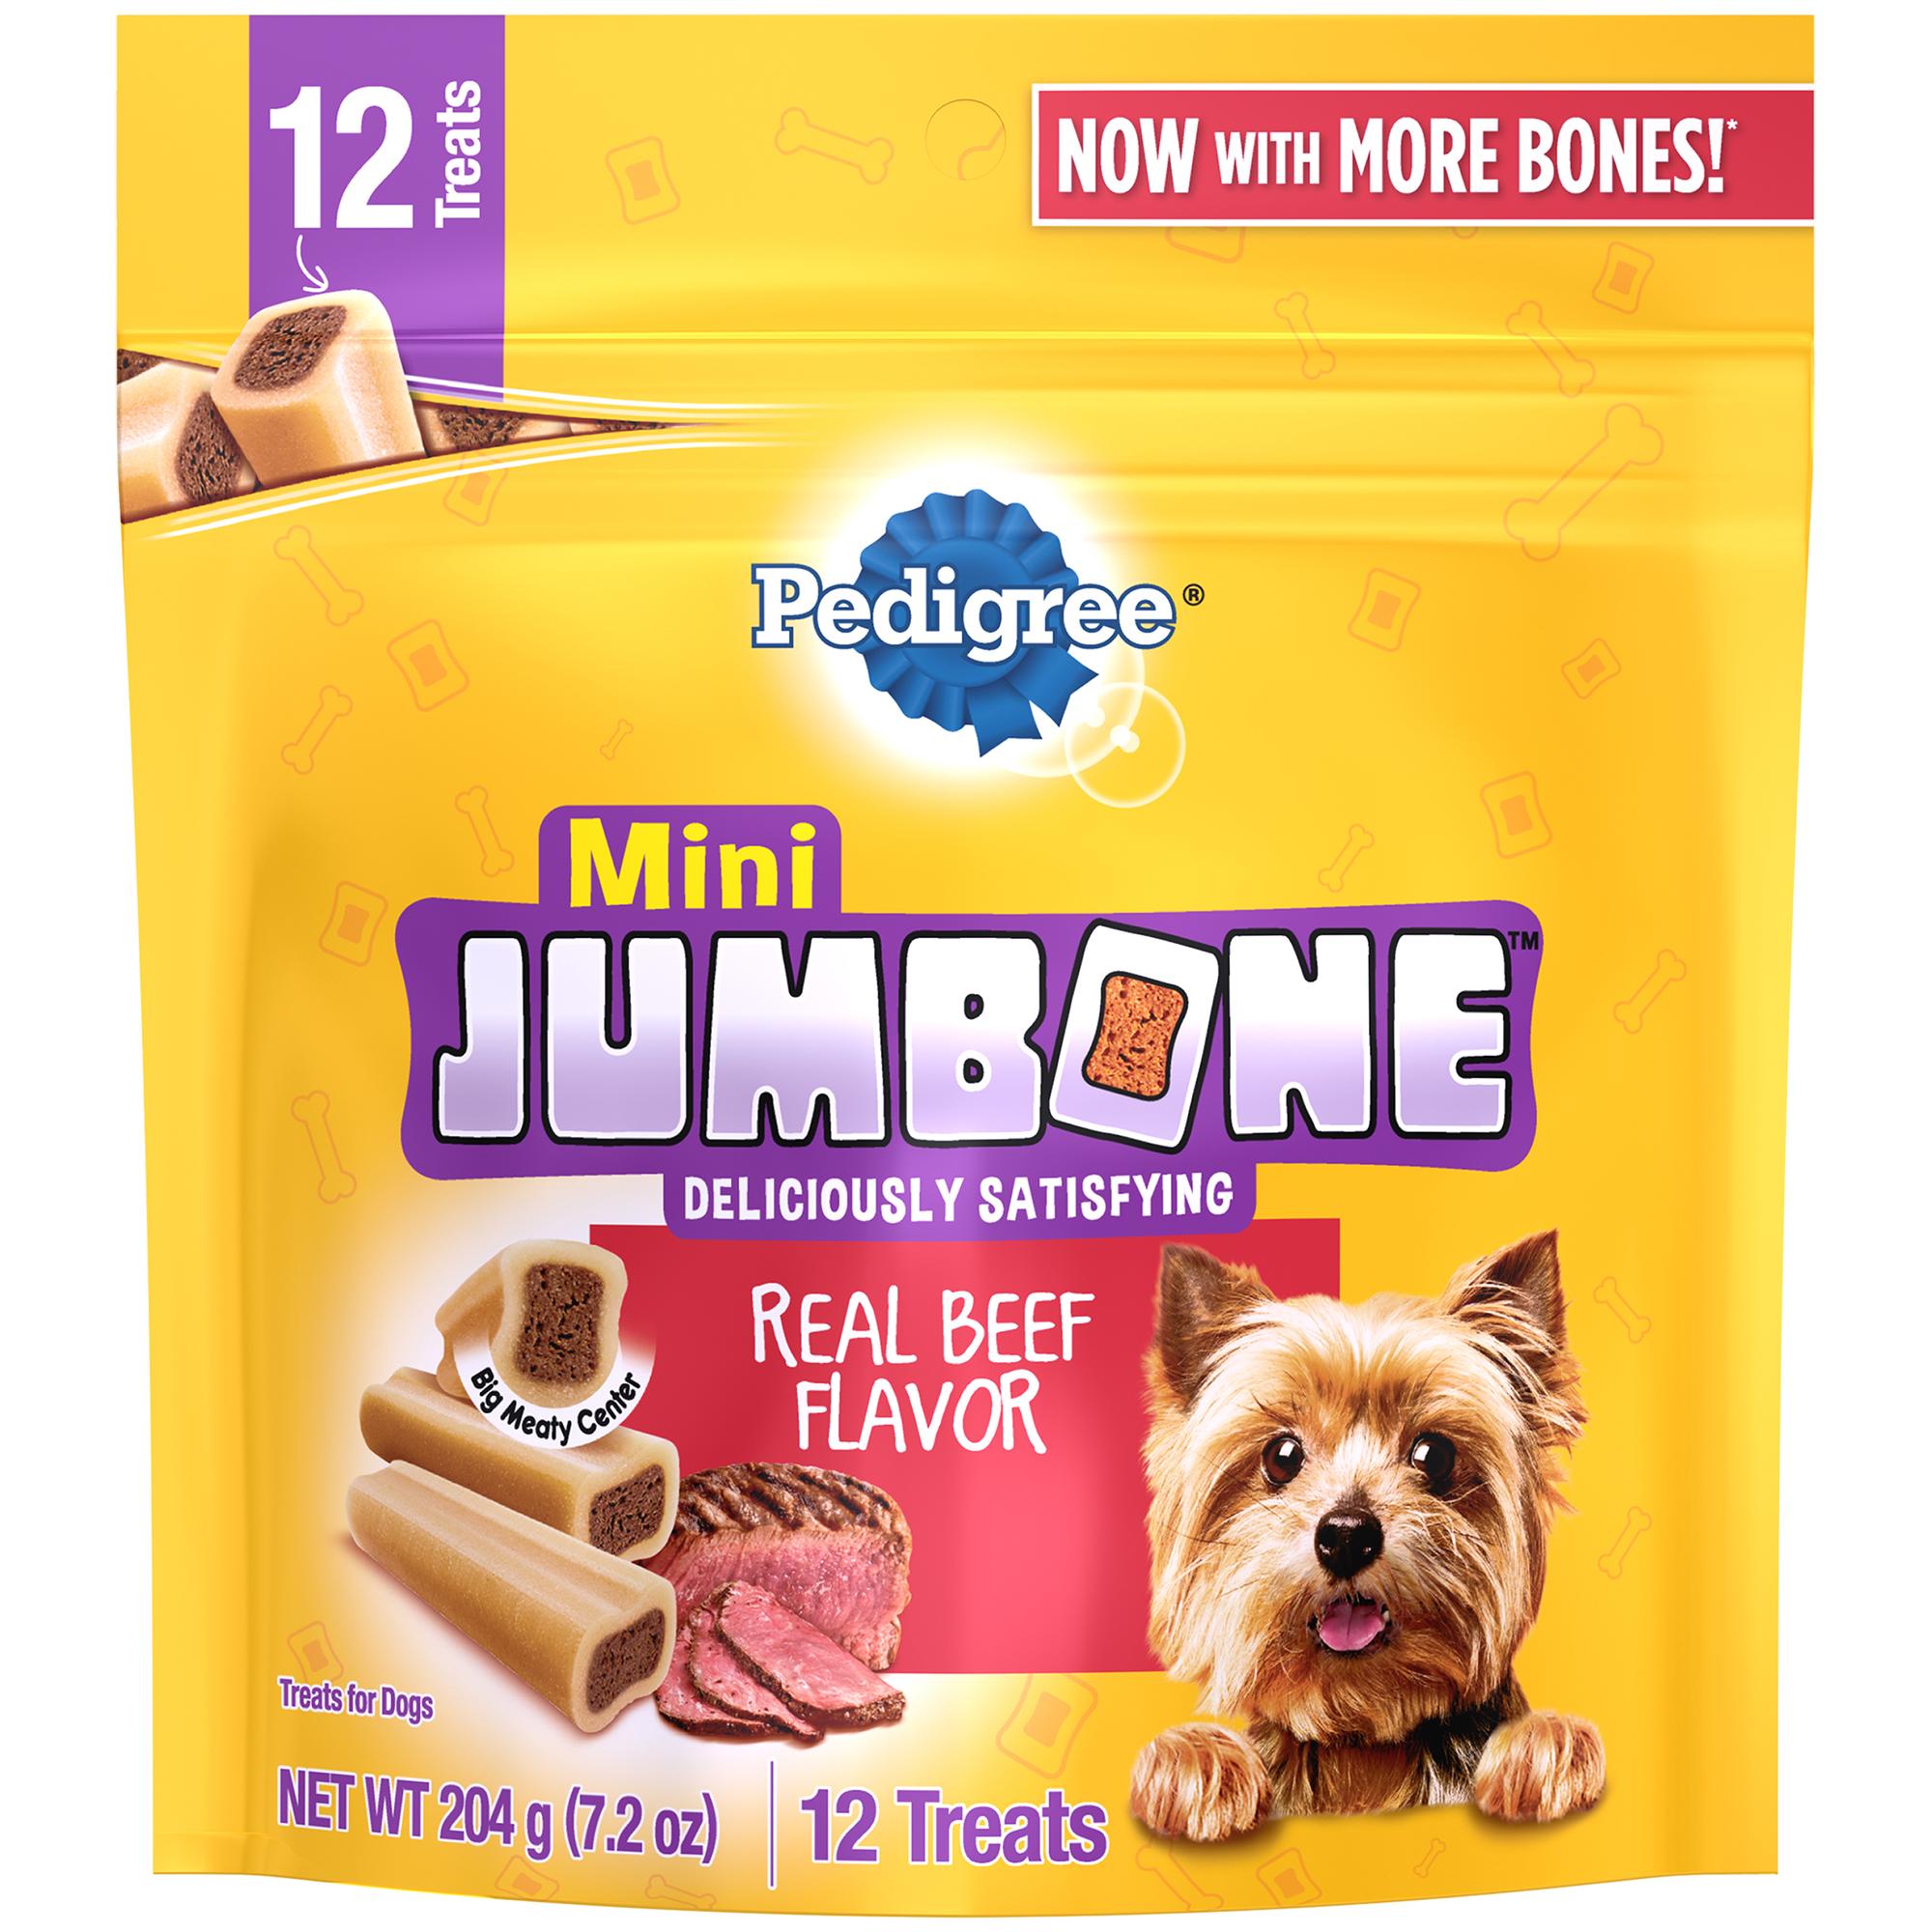 Pedigree Jumbone Small Breed Adult Dog Treats, Beef, 7.2 Oz (12 Treats)